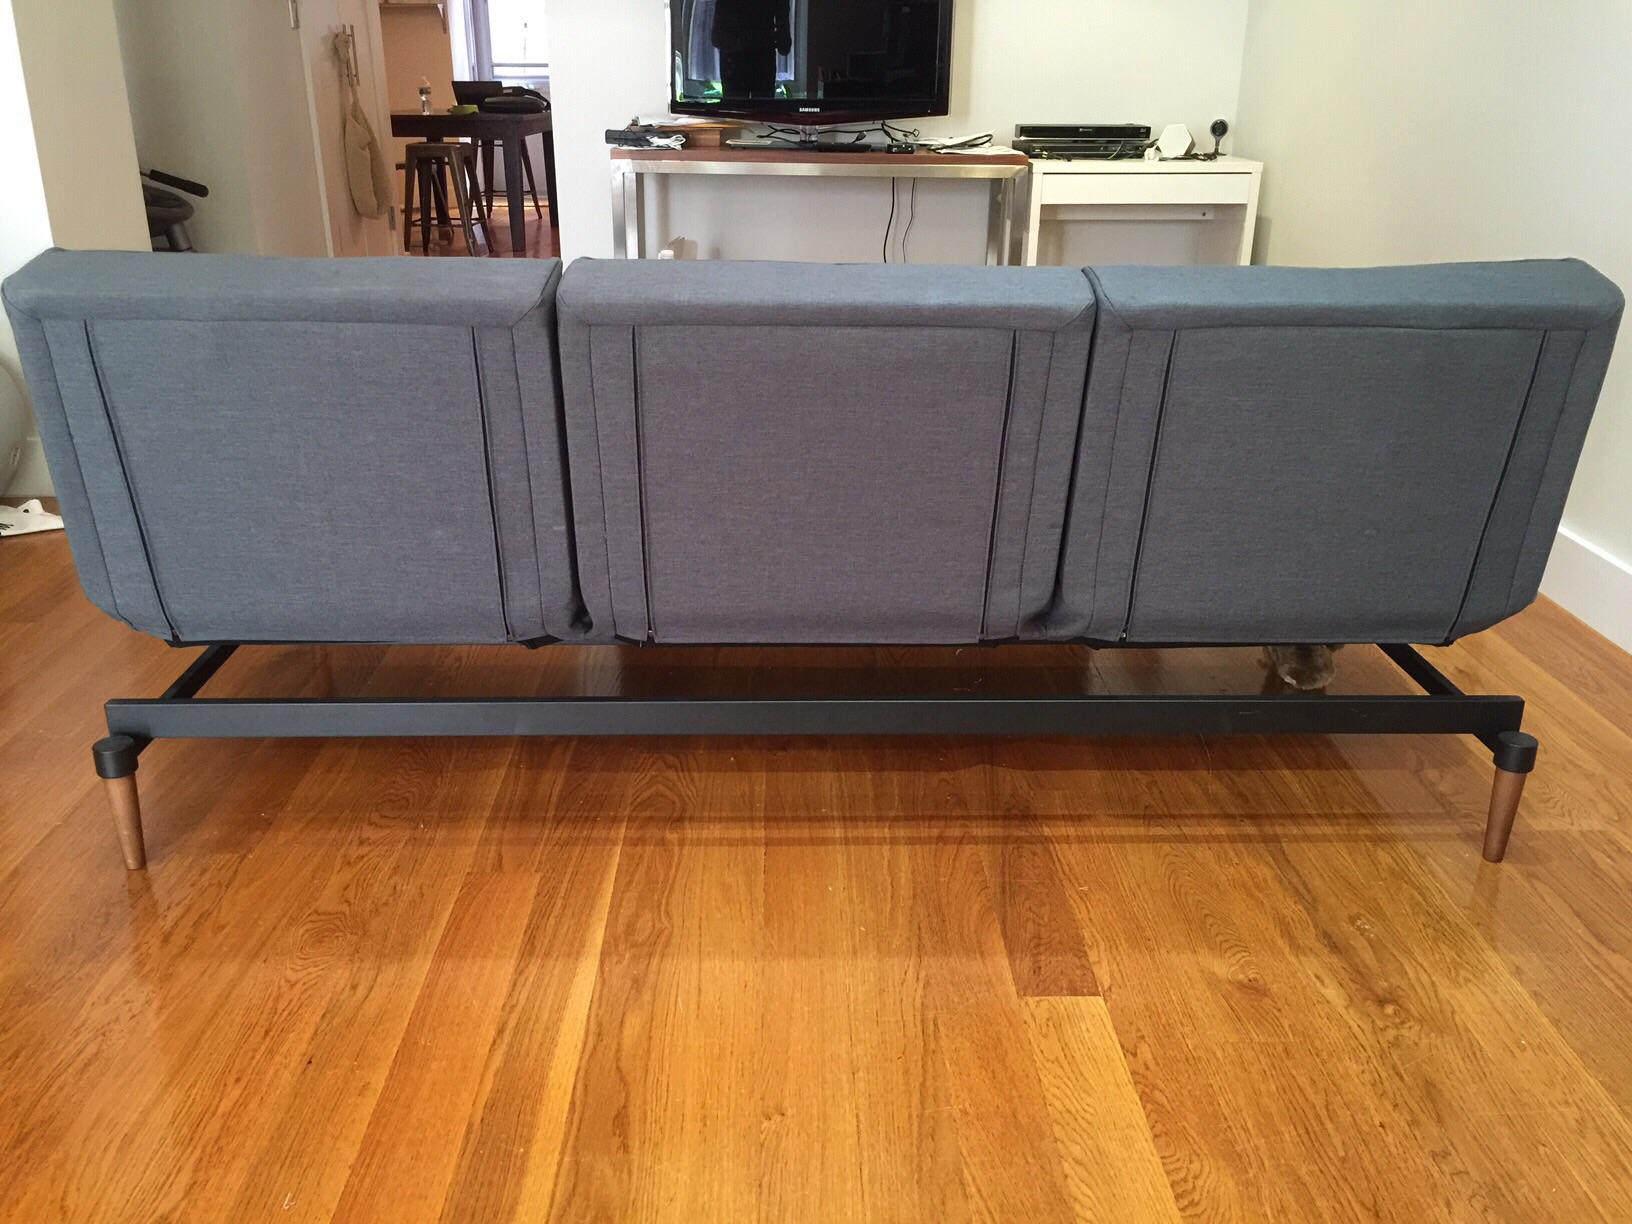 Room Board Eden Convertible Sleeper Sofa Chairish